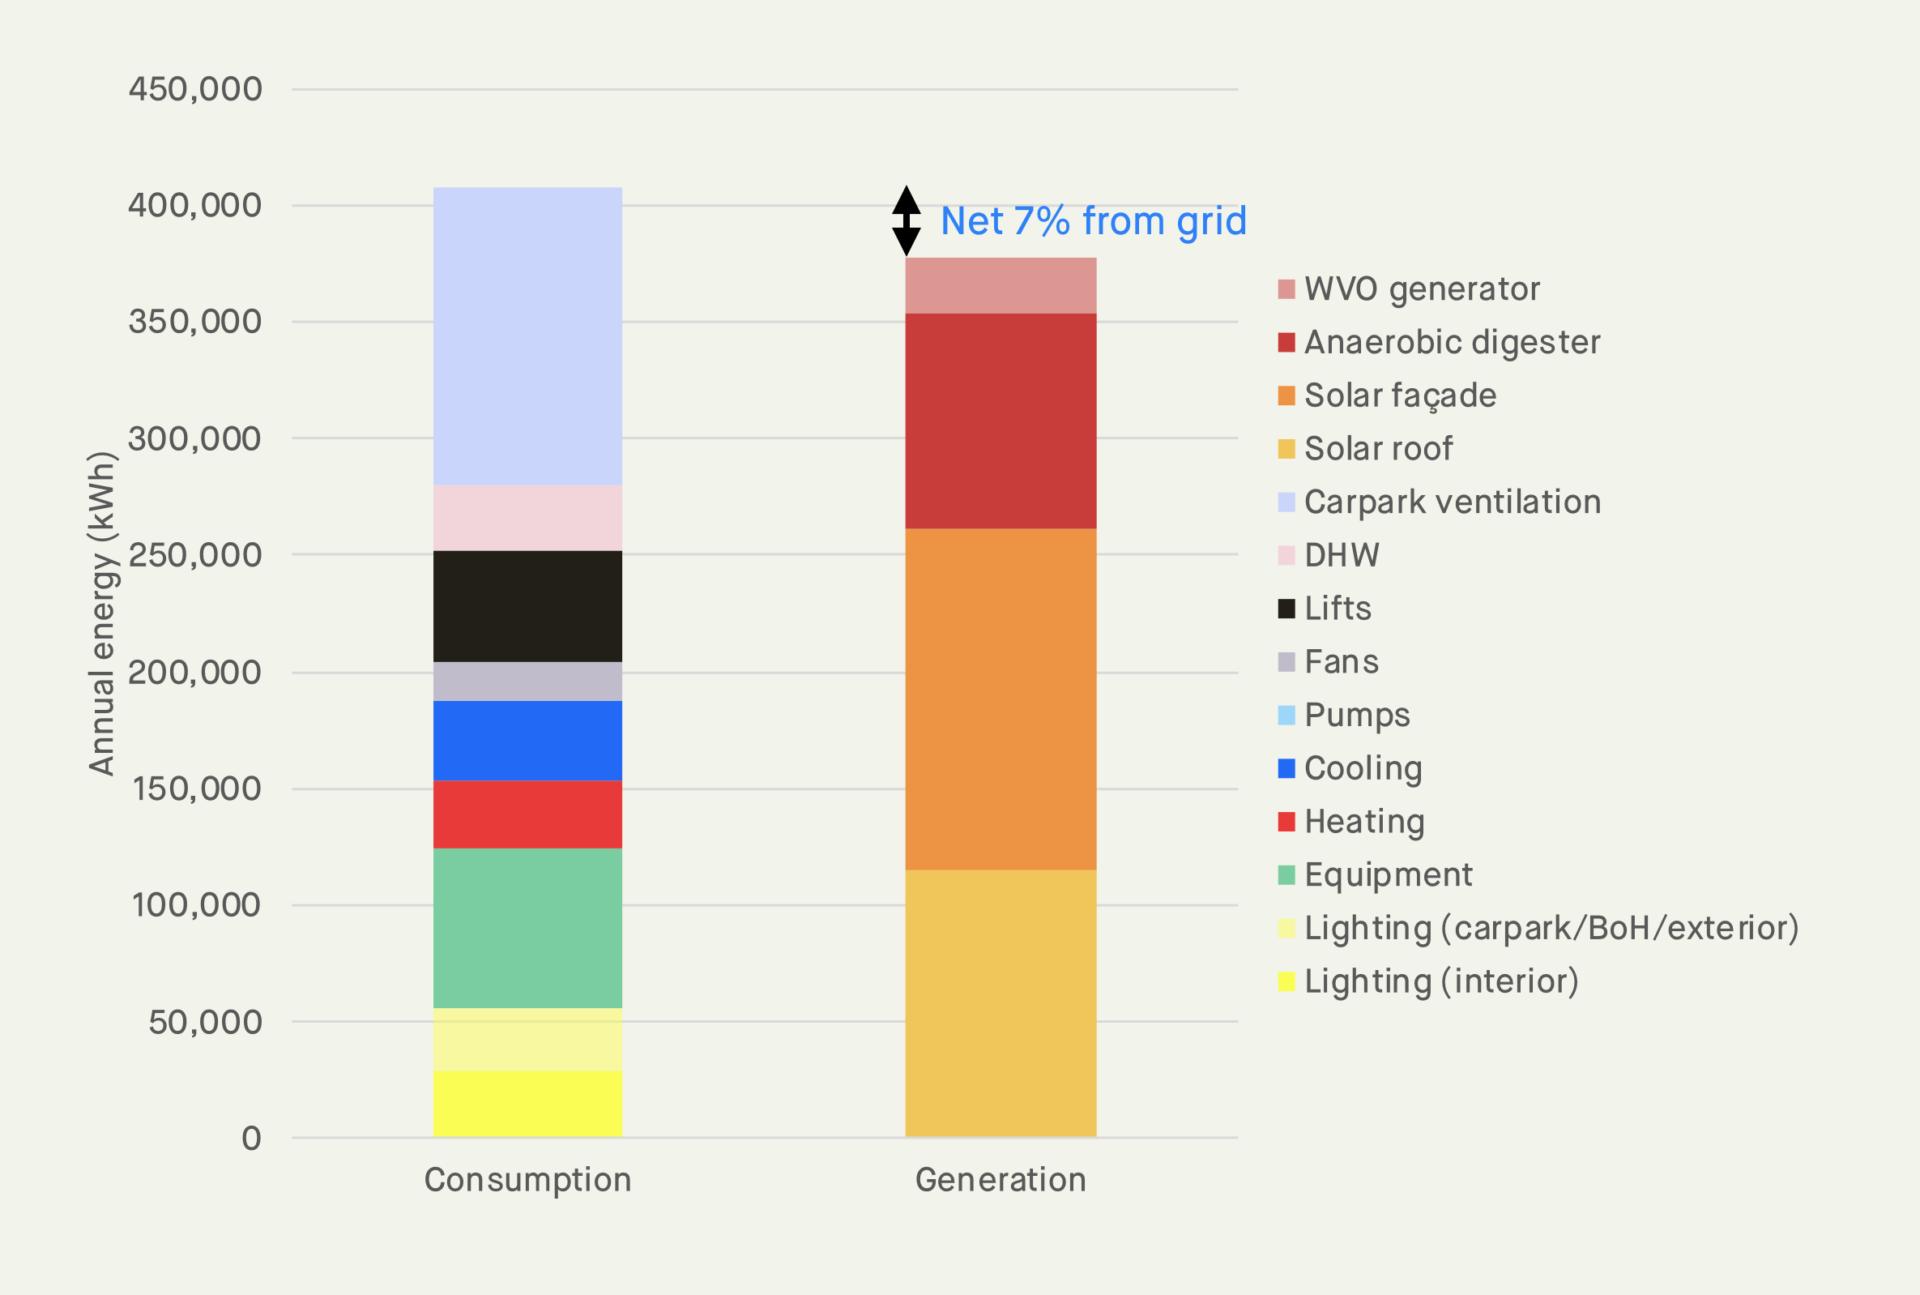 energy consumption v generation